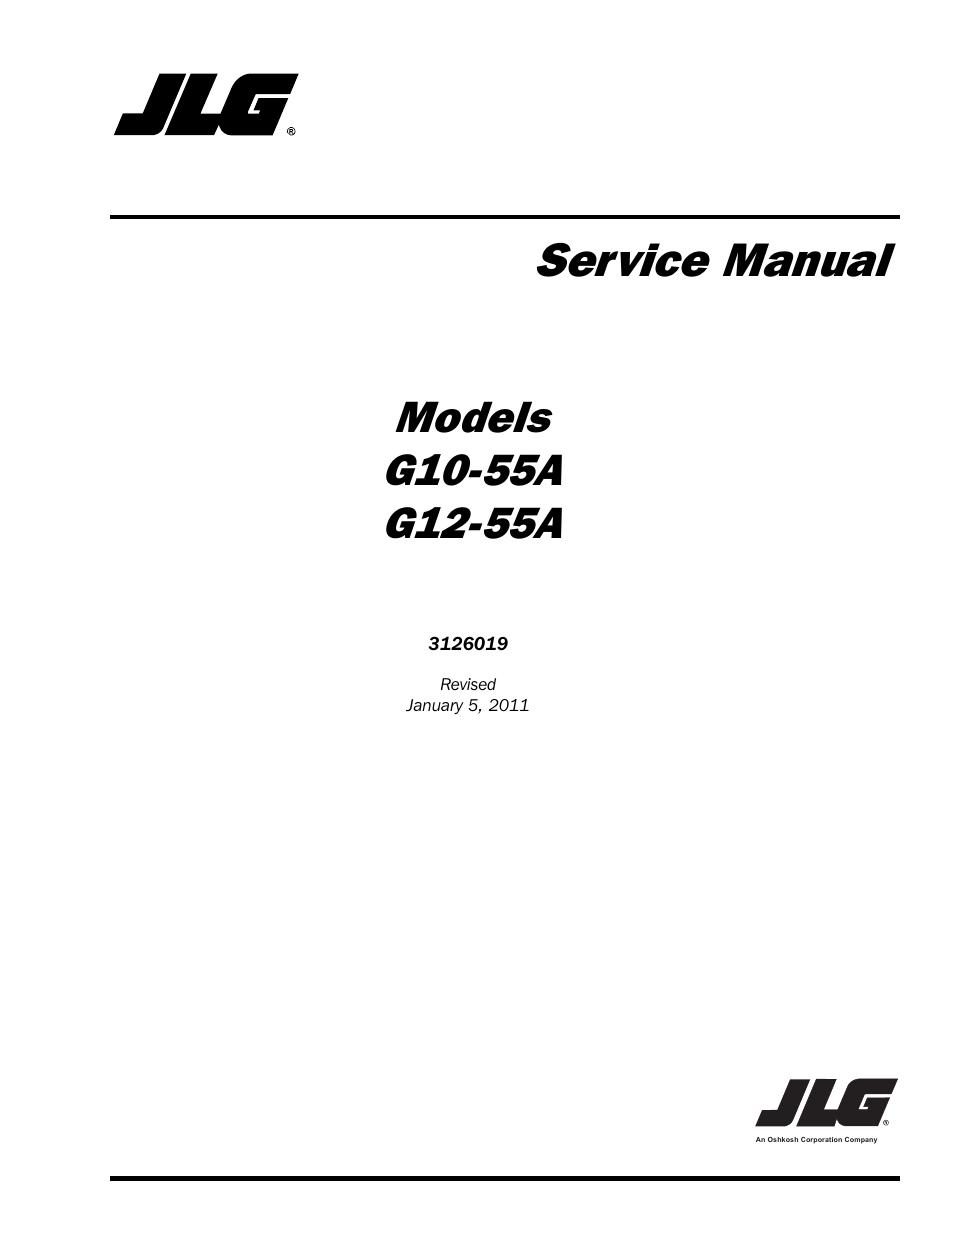 JLG G1255A Service Manual User Manual 200 pages – Jlg Model 42 Wiring Diagram